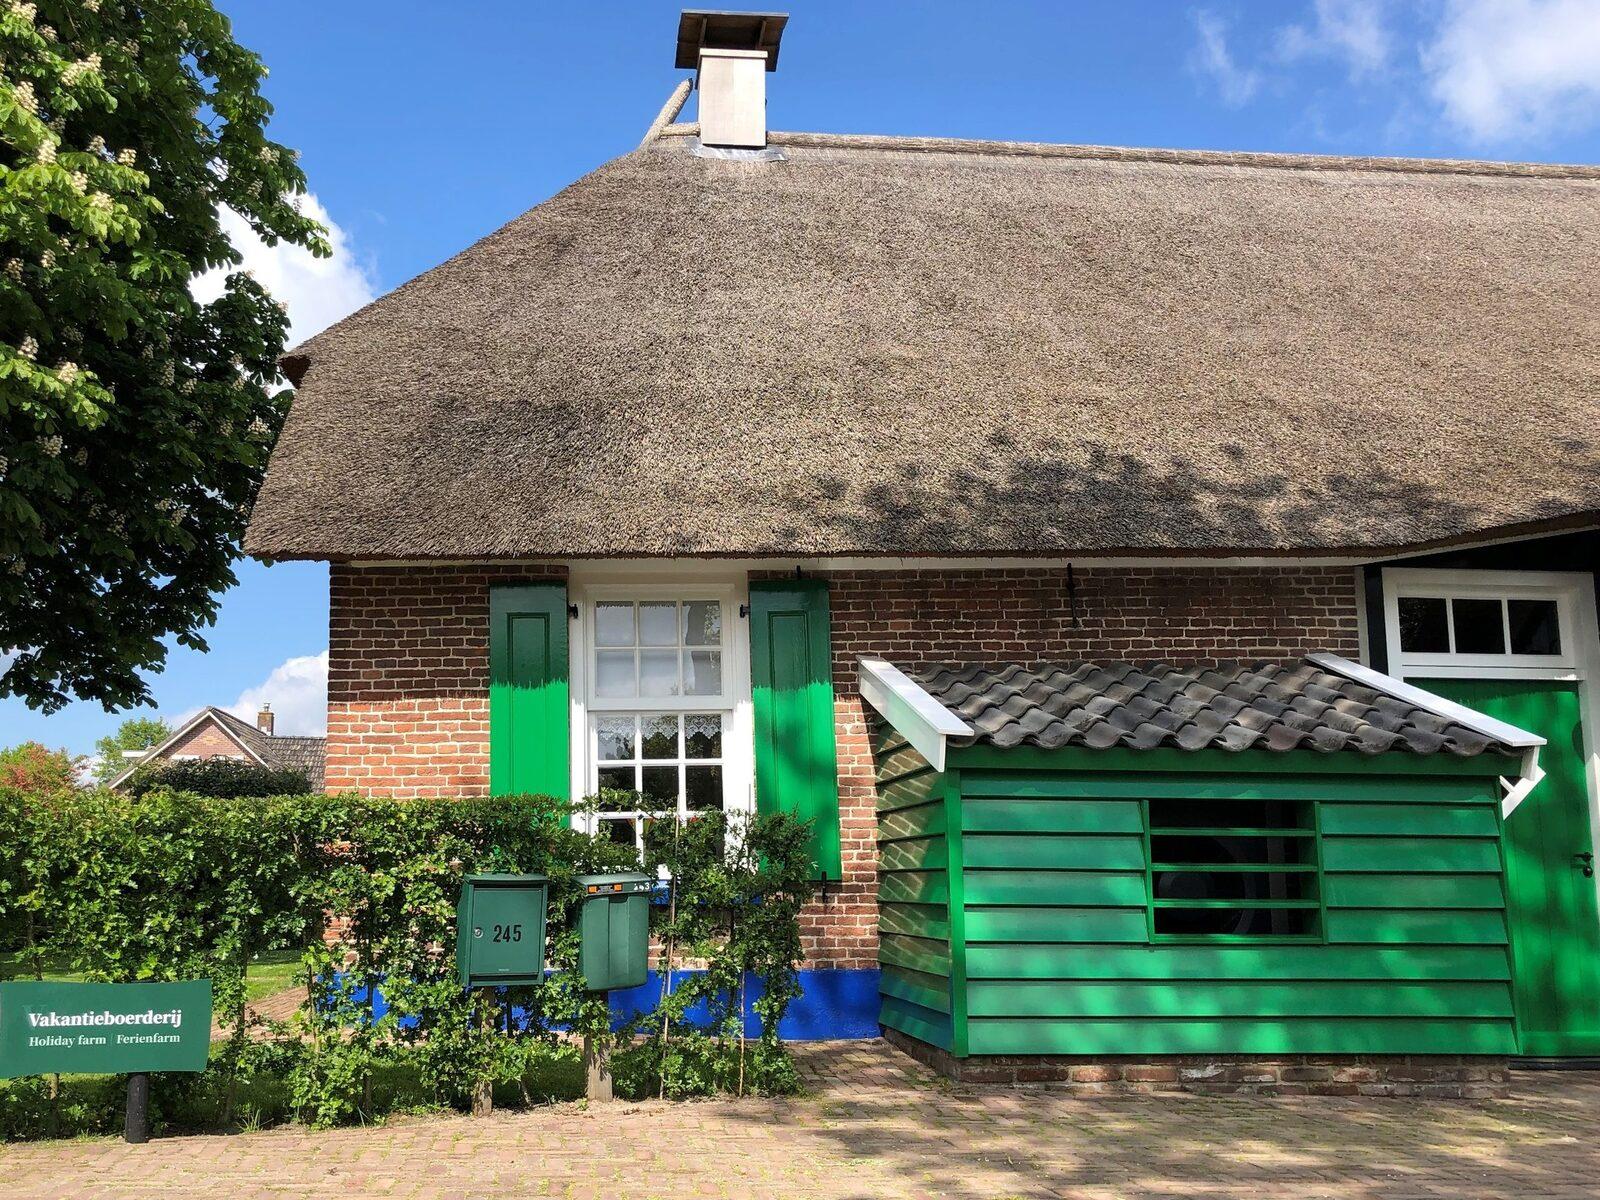 Vakantieboerderij An Diek in Staphorst